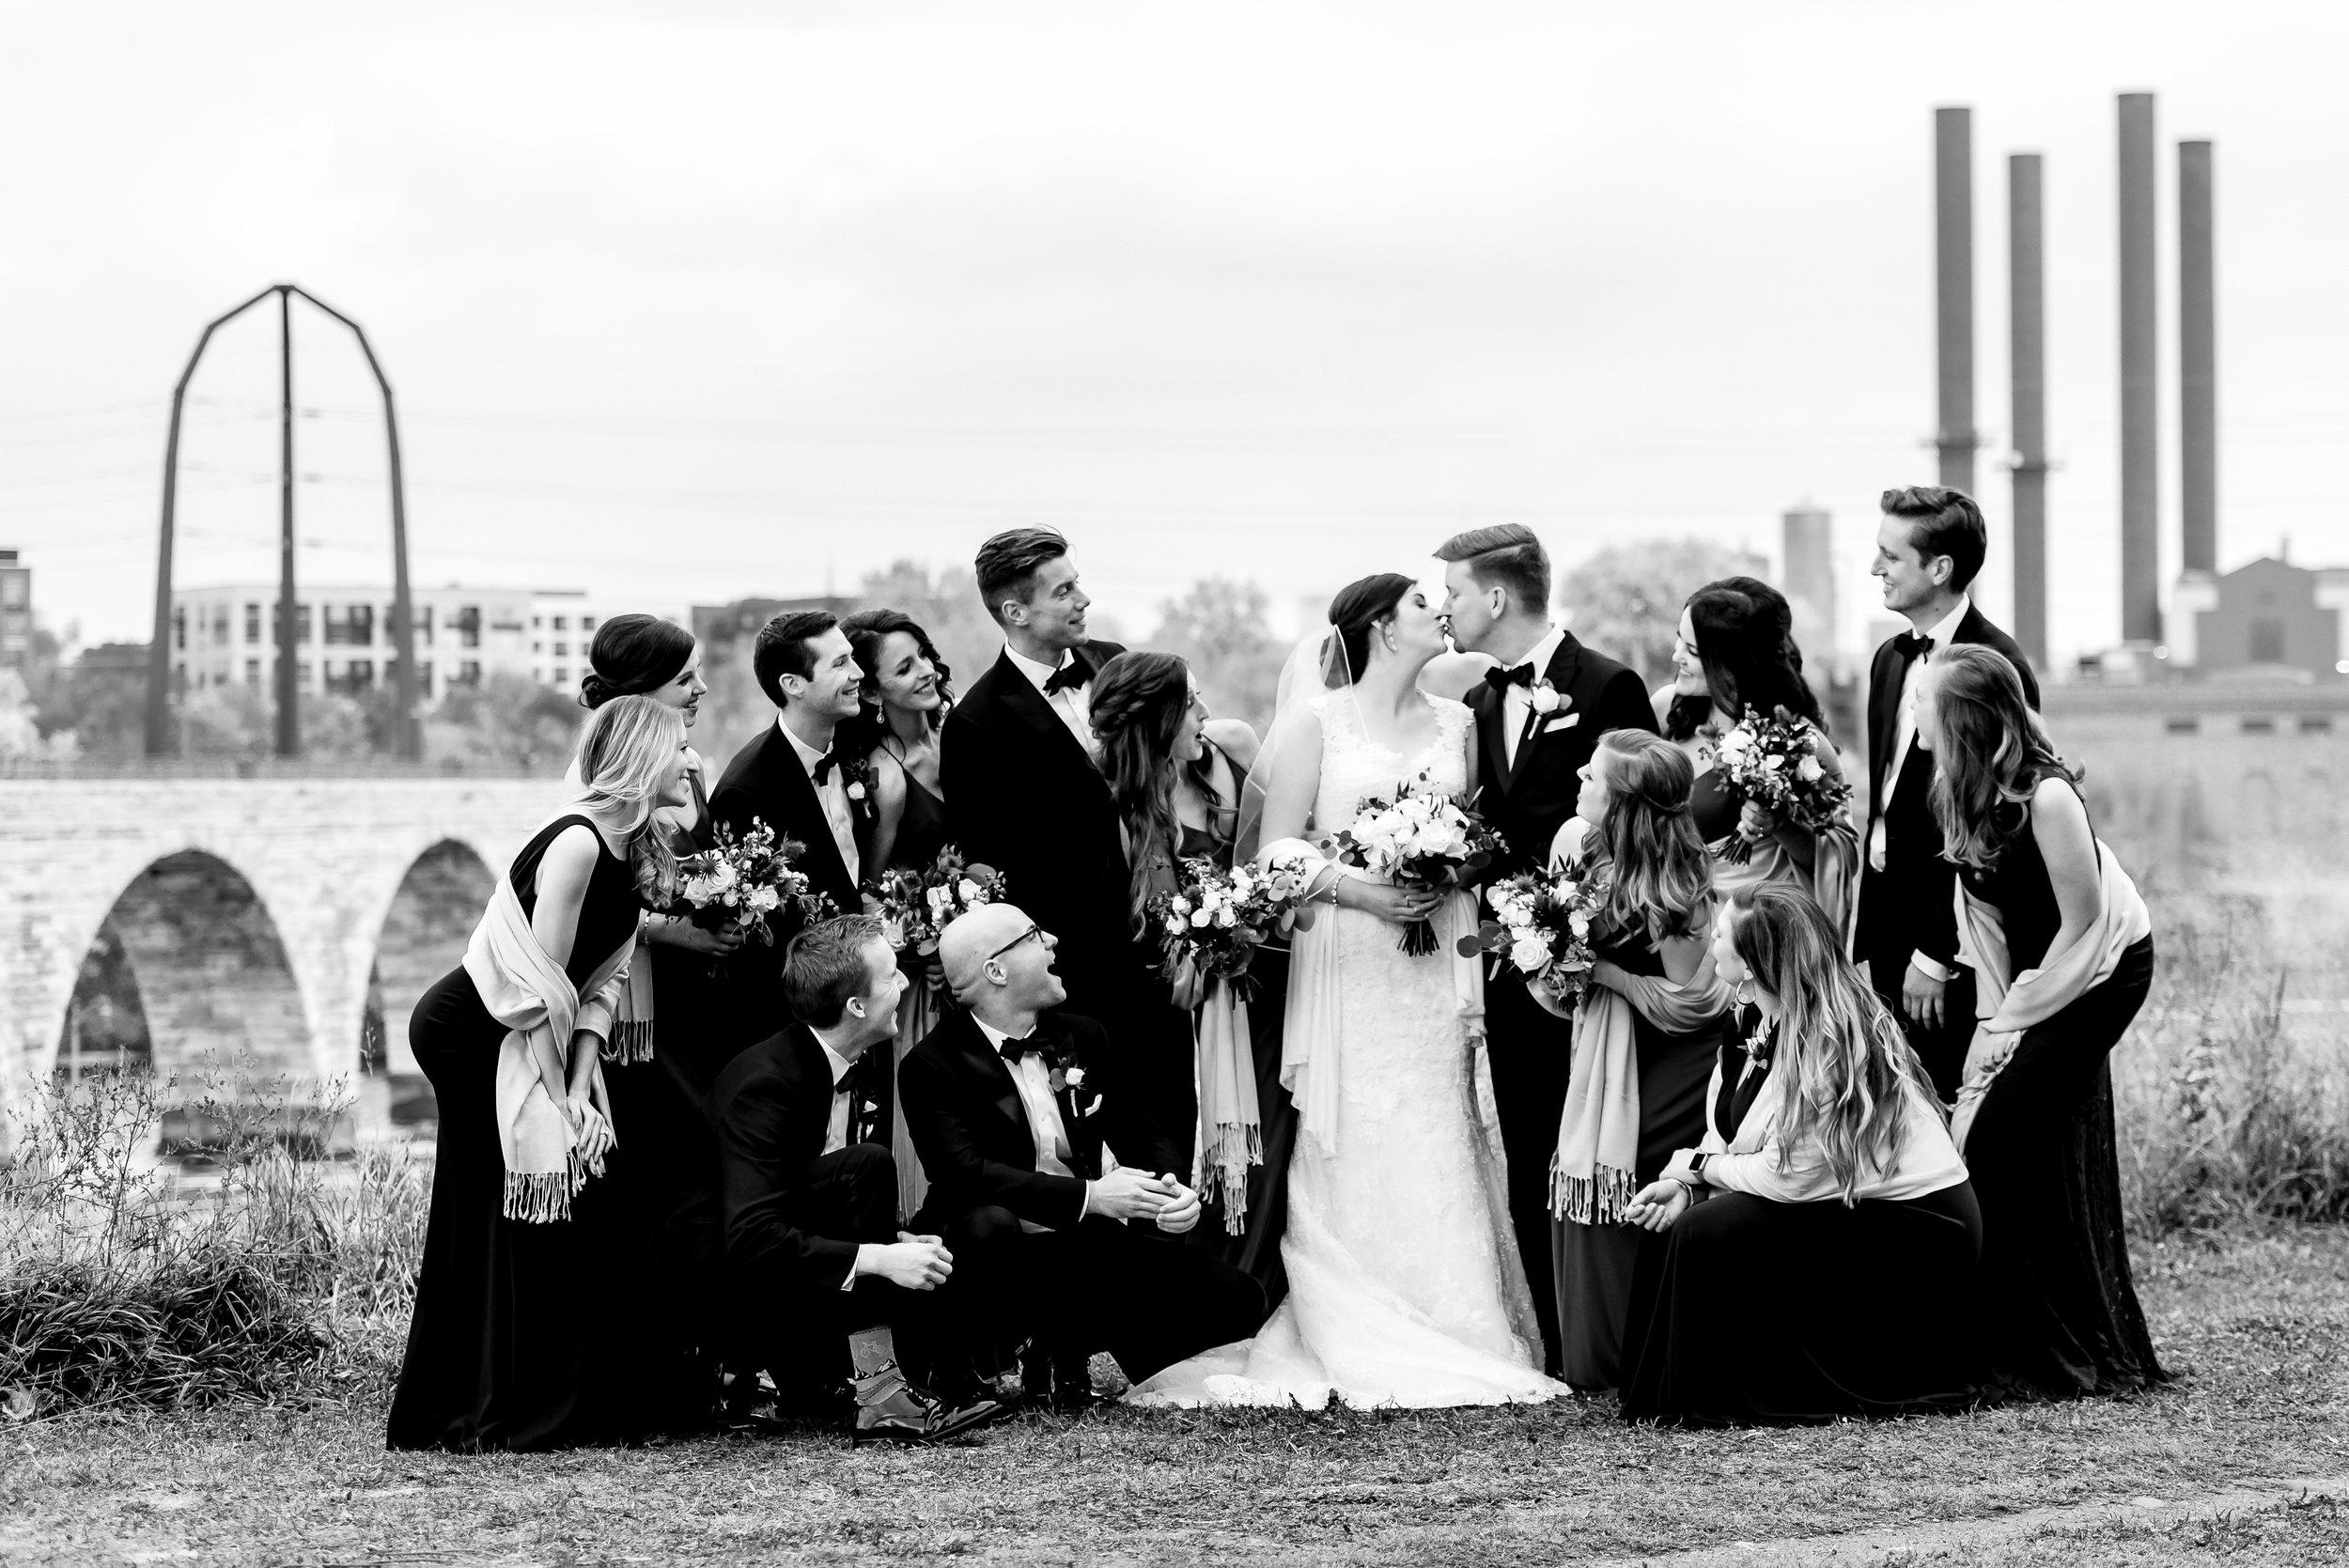 Best Wedding Photography Locations in MN - Minneapolis Wedding Photographer